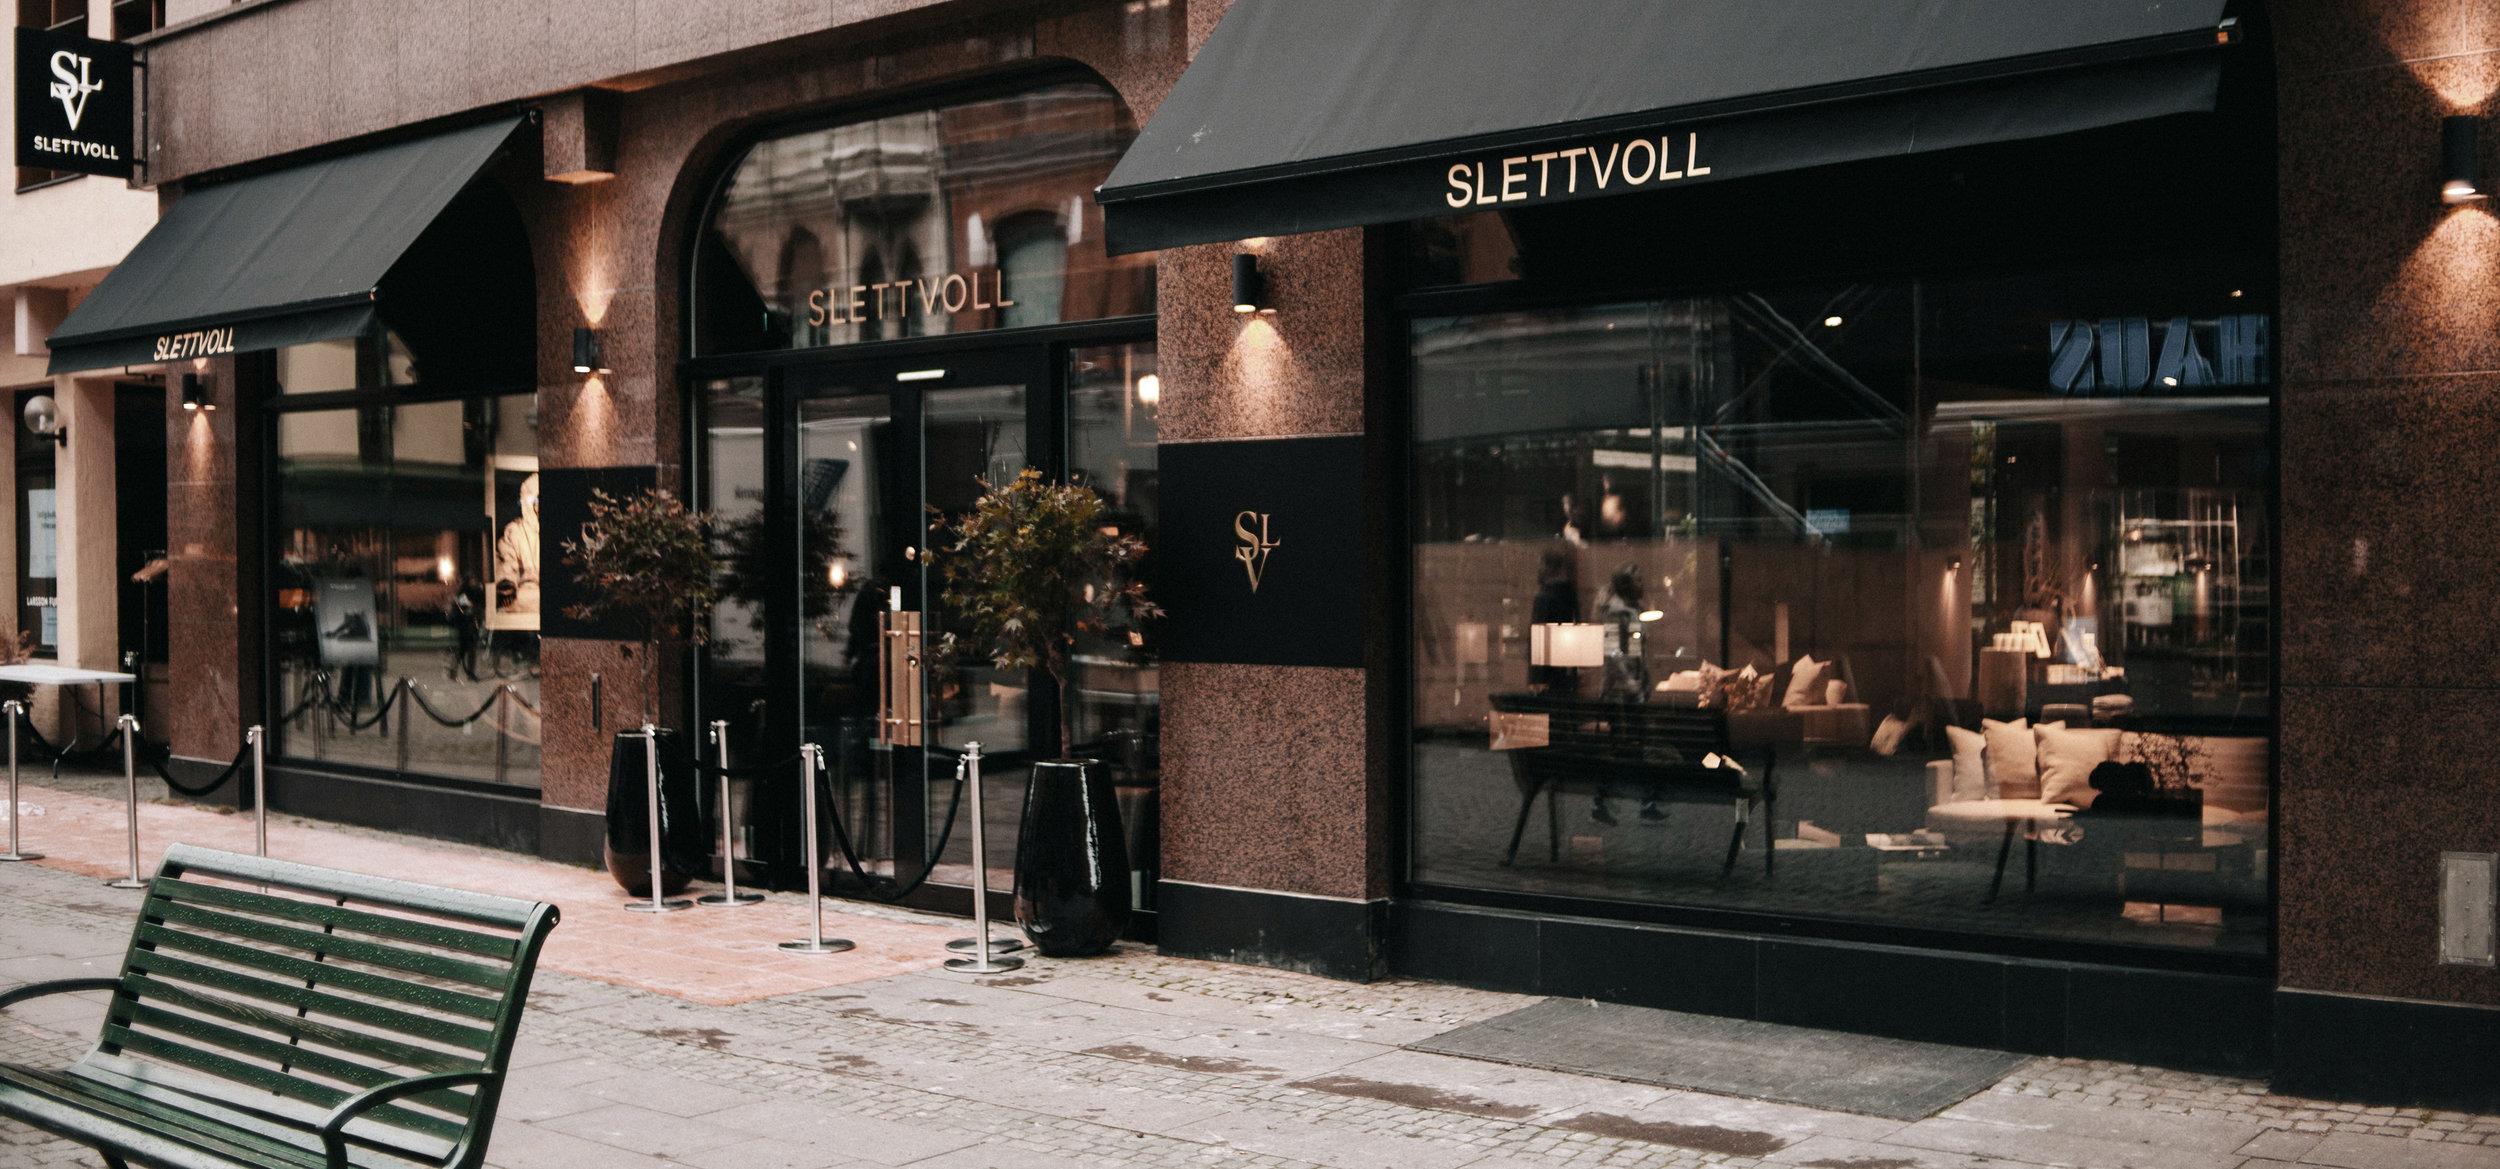 Slettvoll Malmø facade, Scandinavian design done by GARDE architecture & design